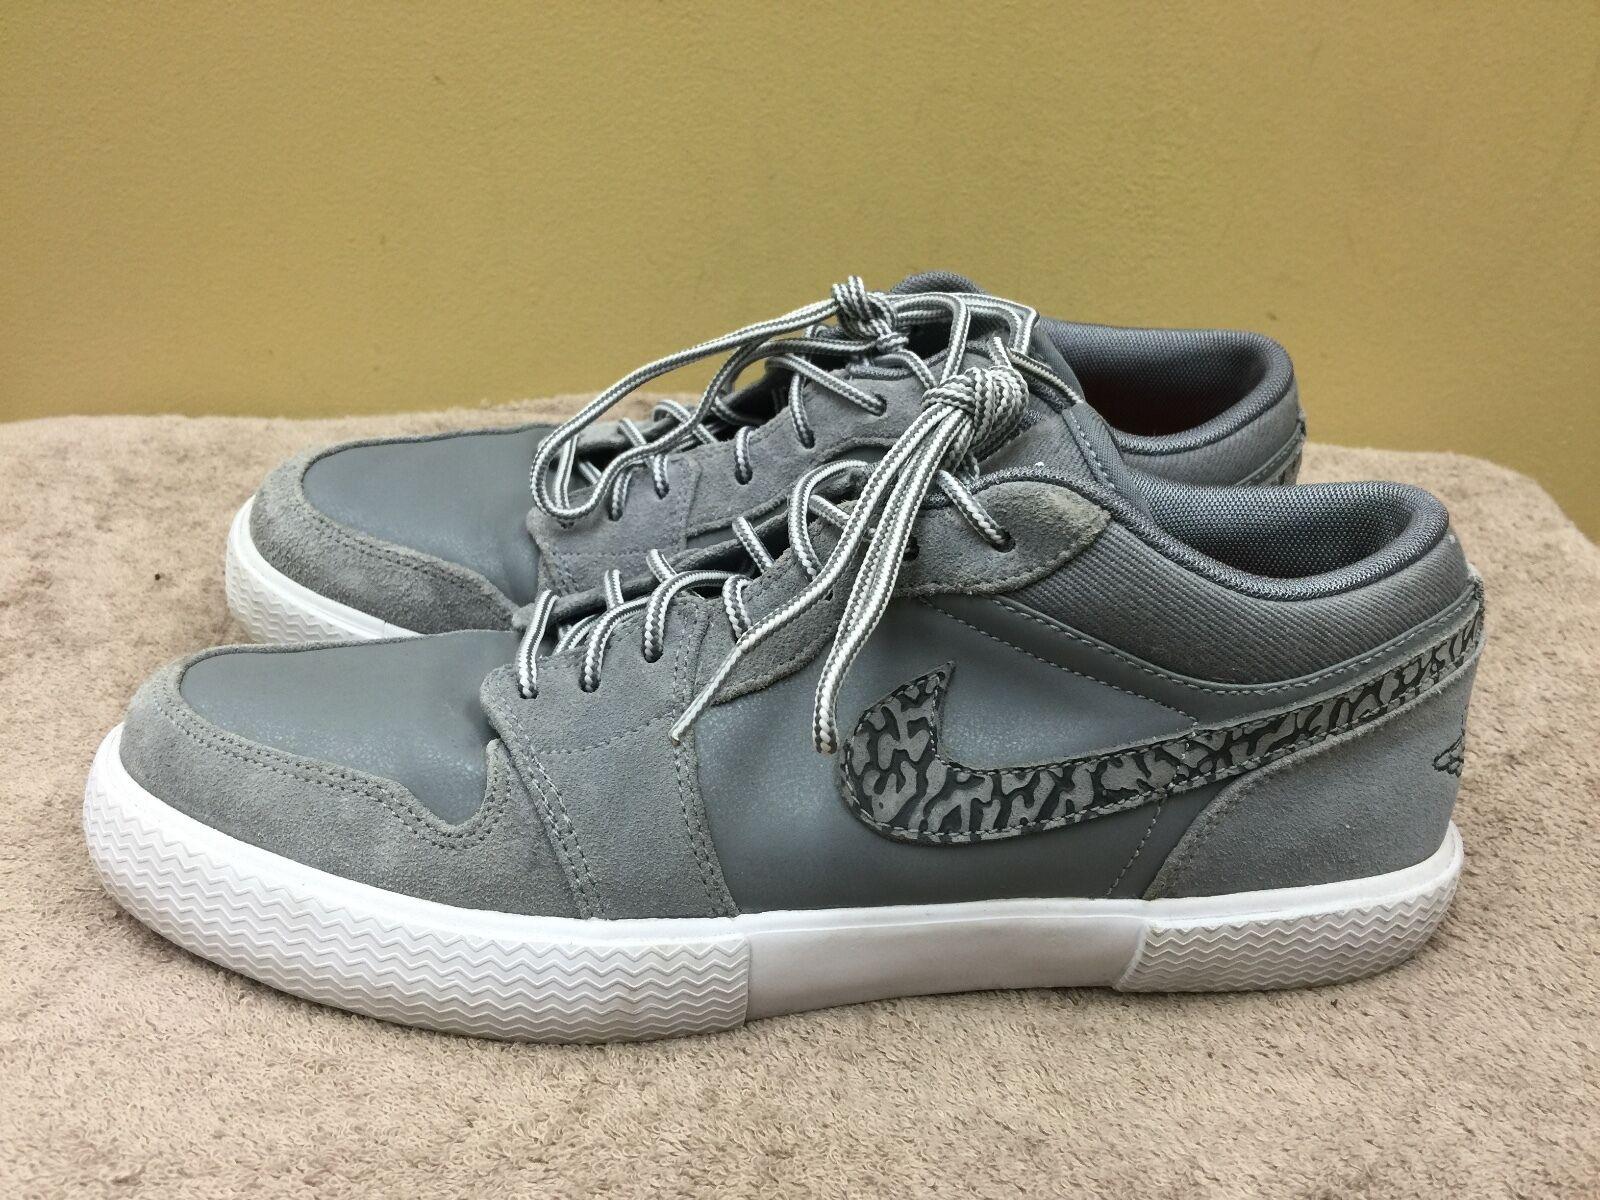 Nike Air Jordan Retro V.1 Cool Grey Anthracite White size 9.5  481177-010